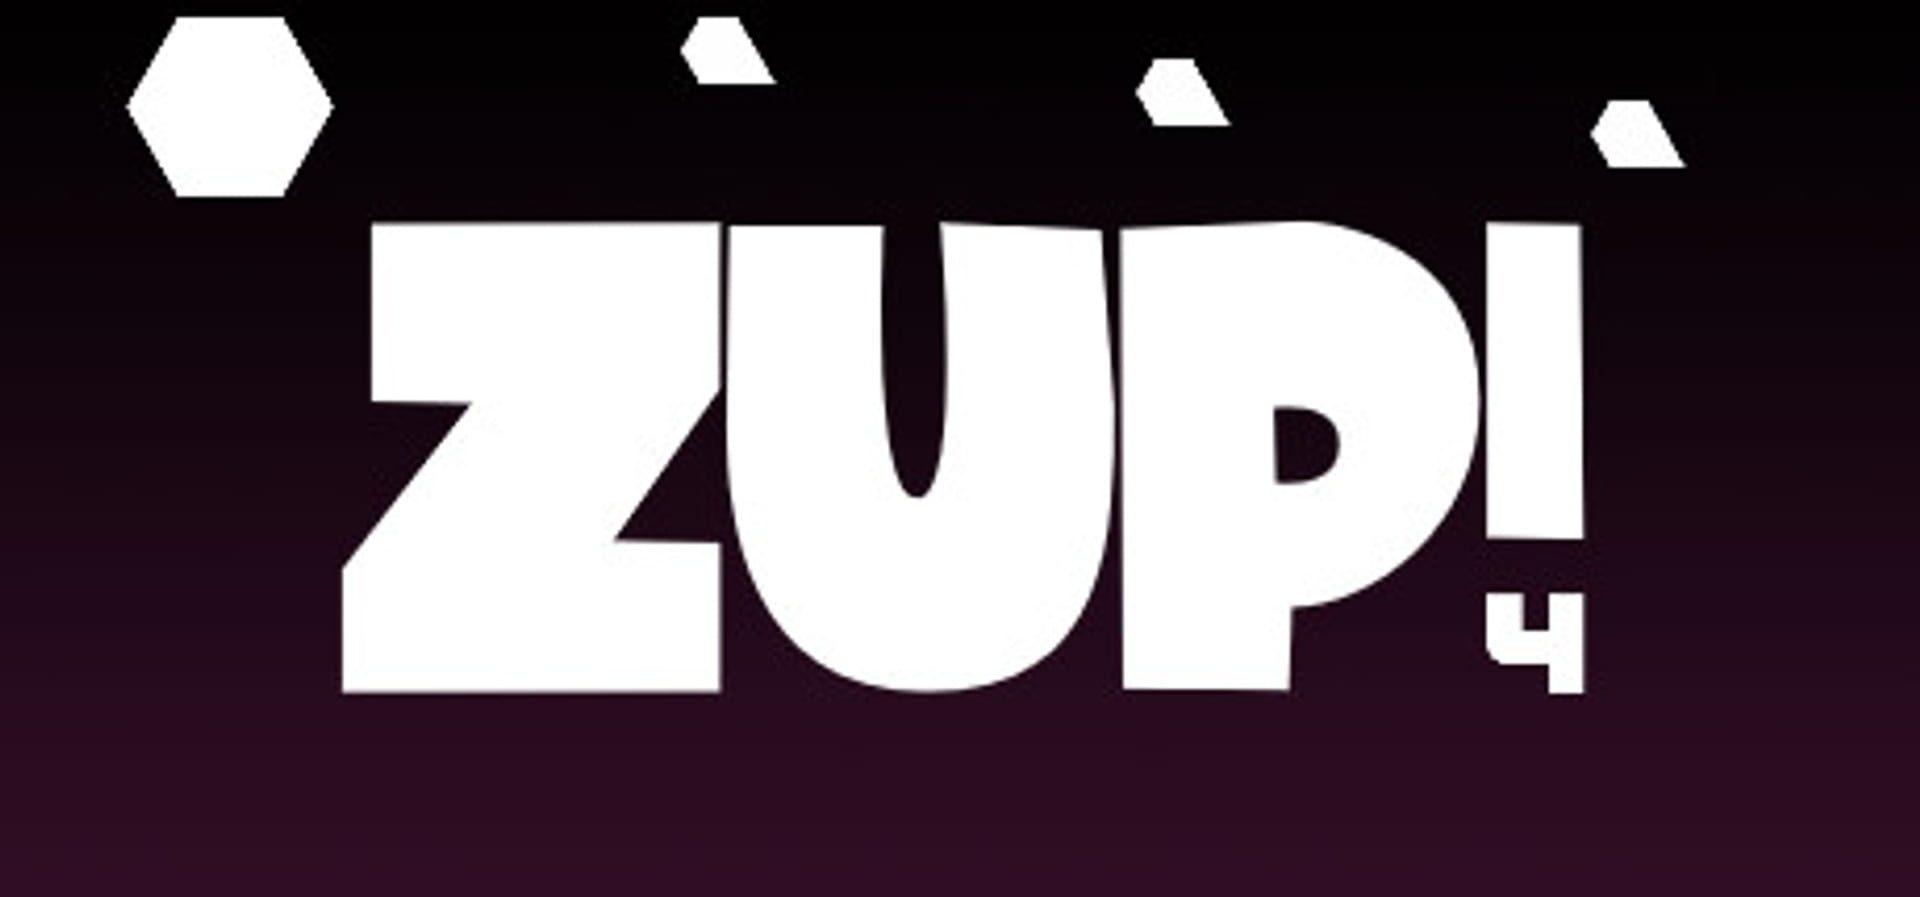 buy Zup! 4 cd key for all platform